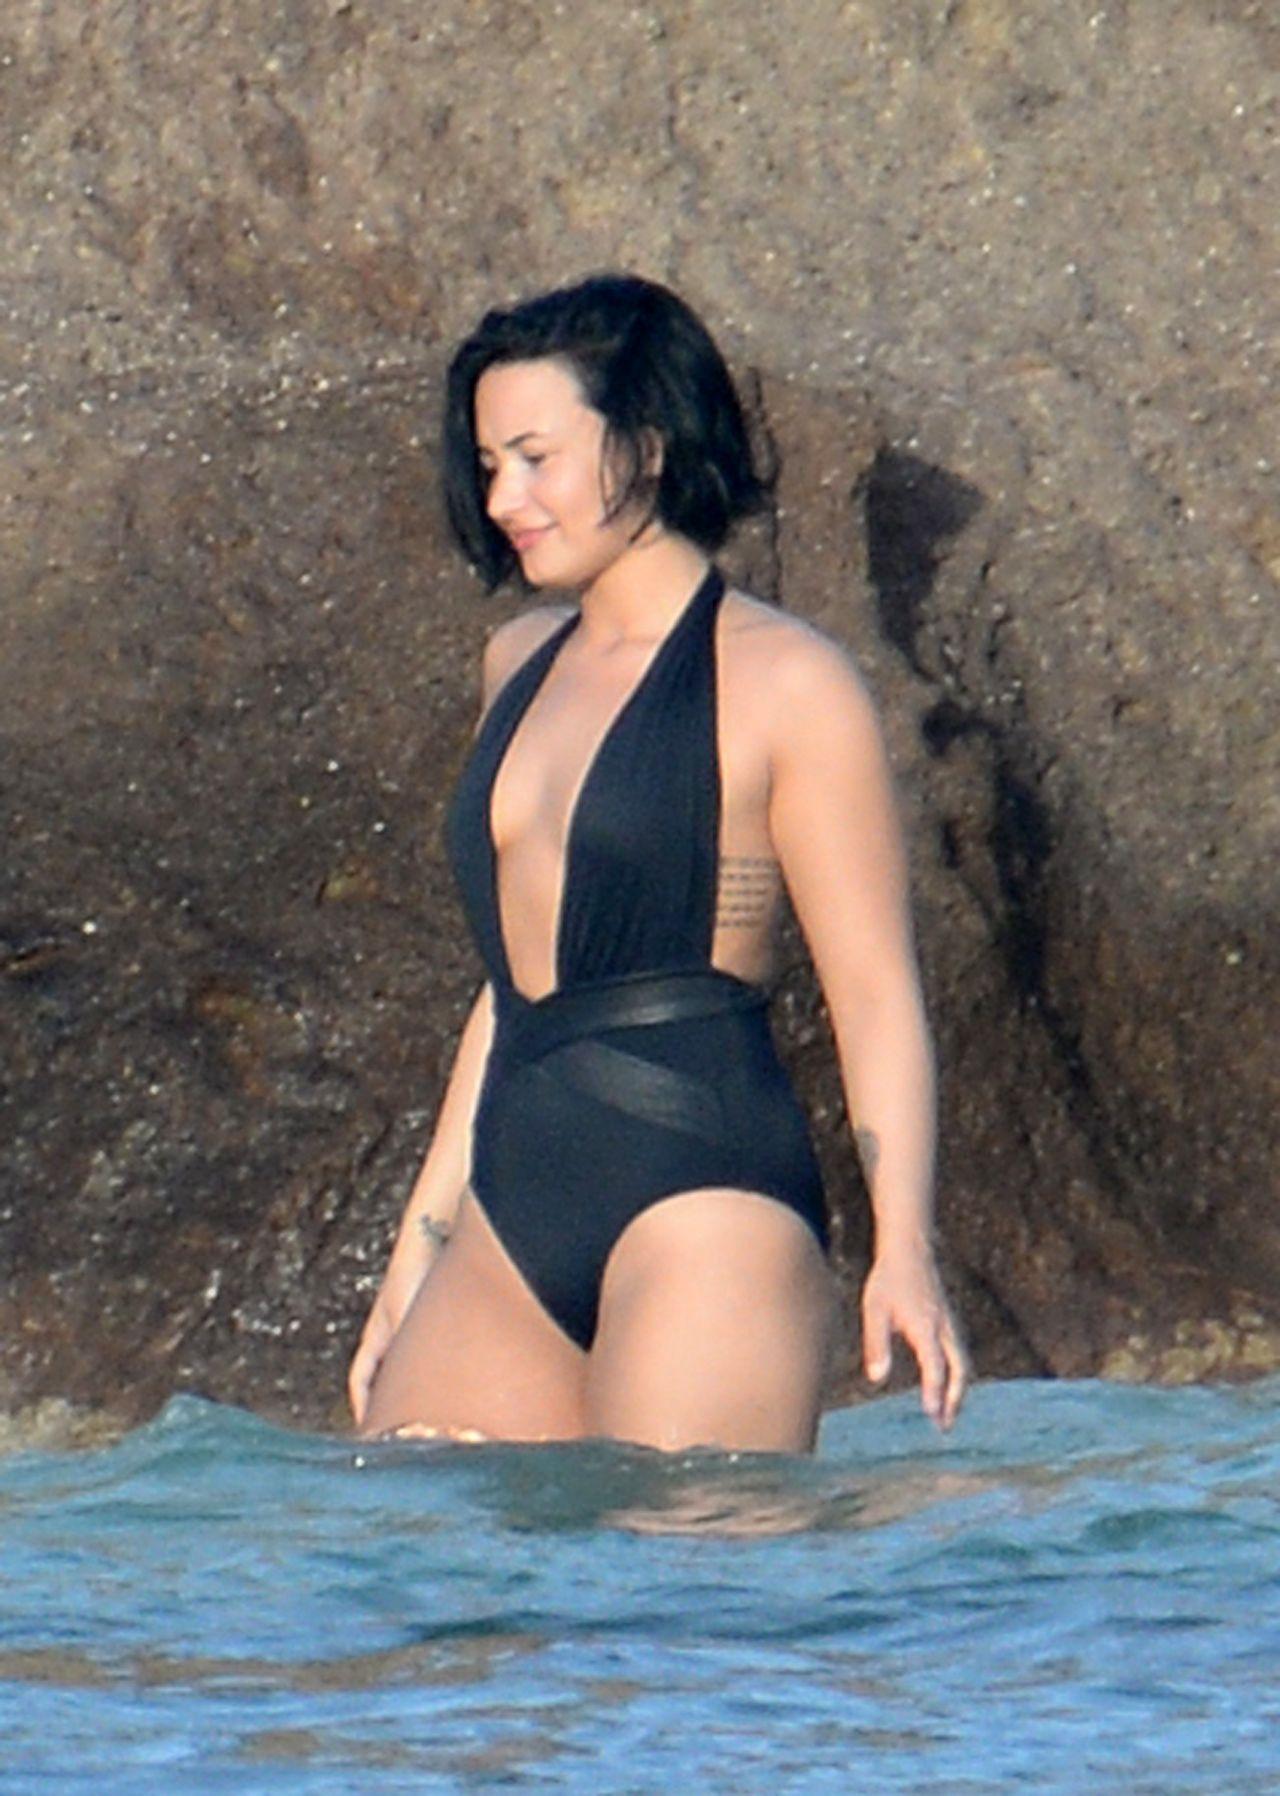 Girl In Rain Wallpaper For Facebook Demi Lovato Wearing A Swimsuit In St Barts 12 17 2015